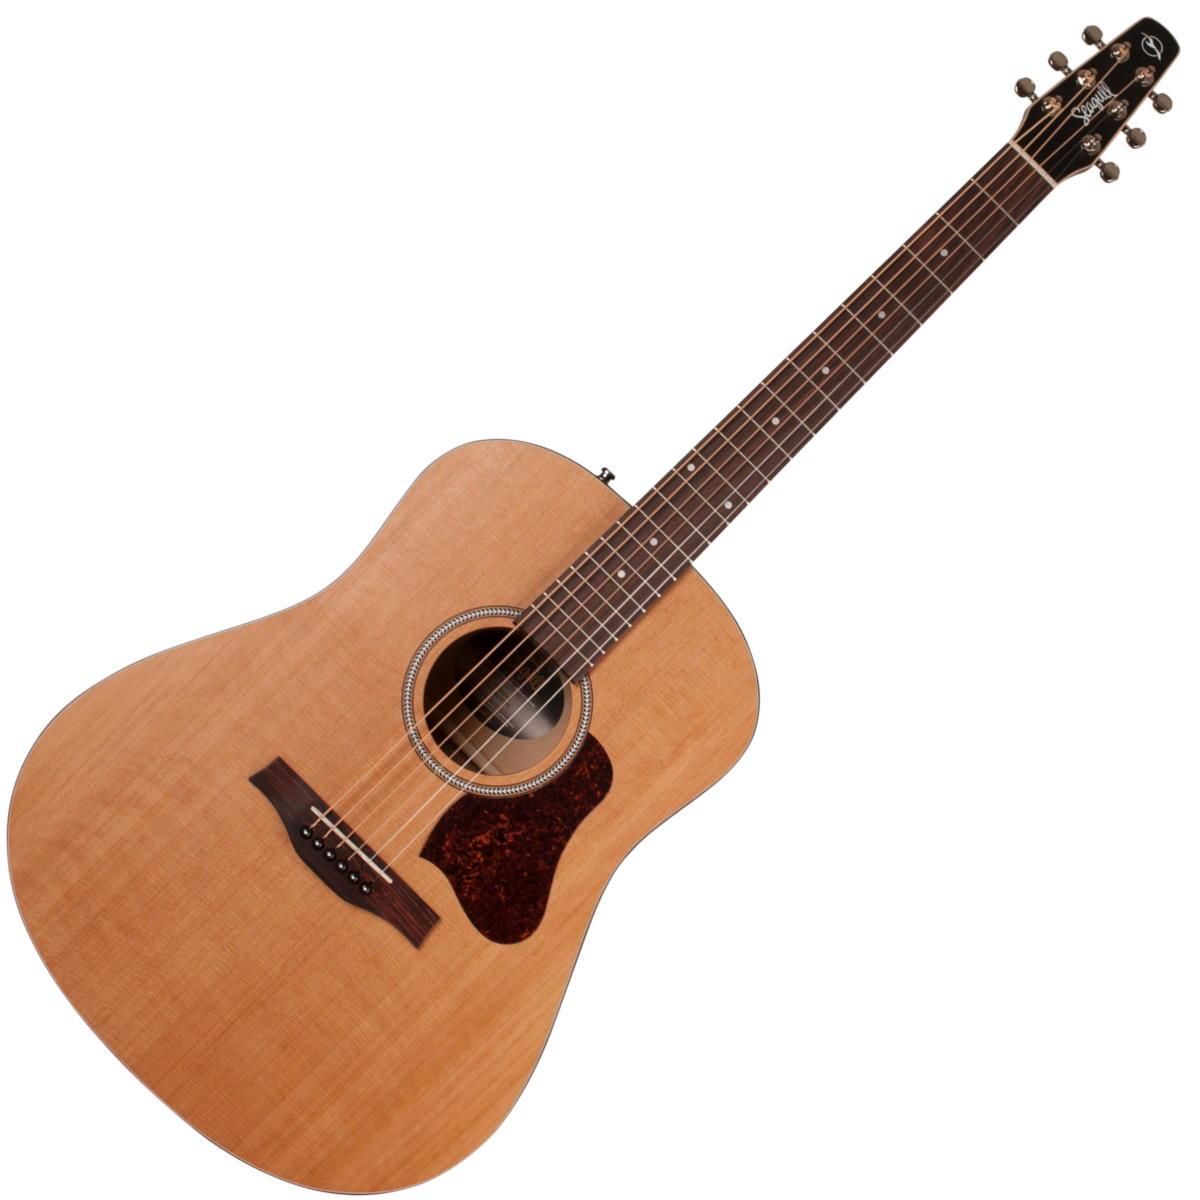 Seagull Guitars S6 Original